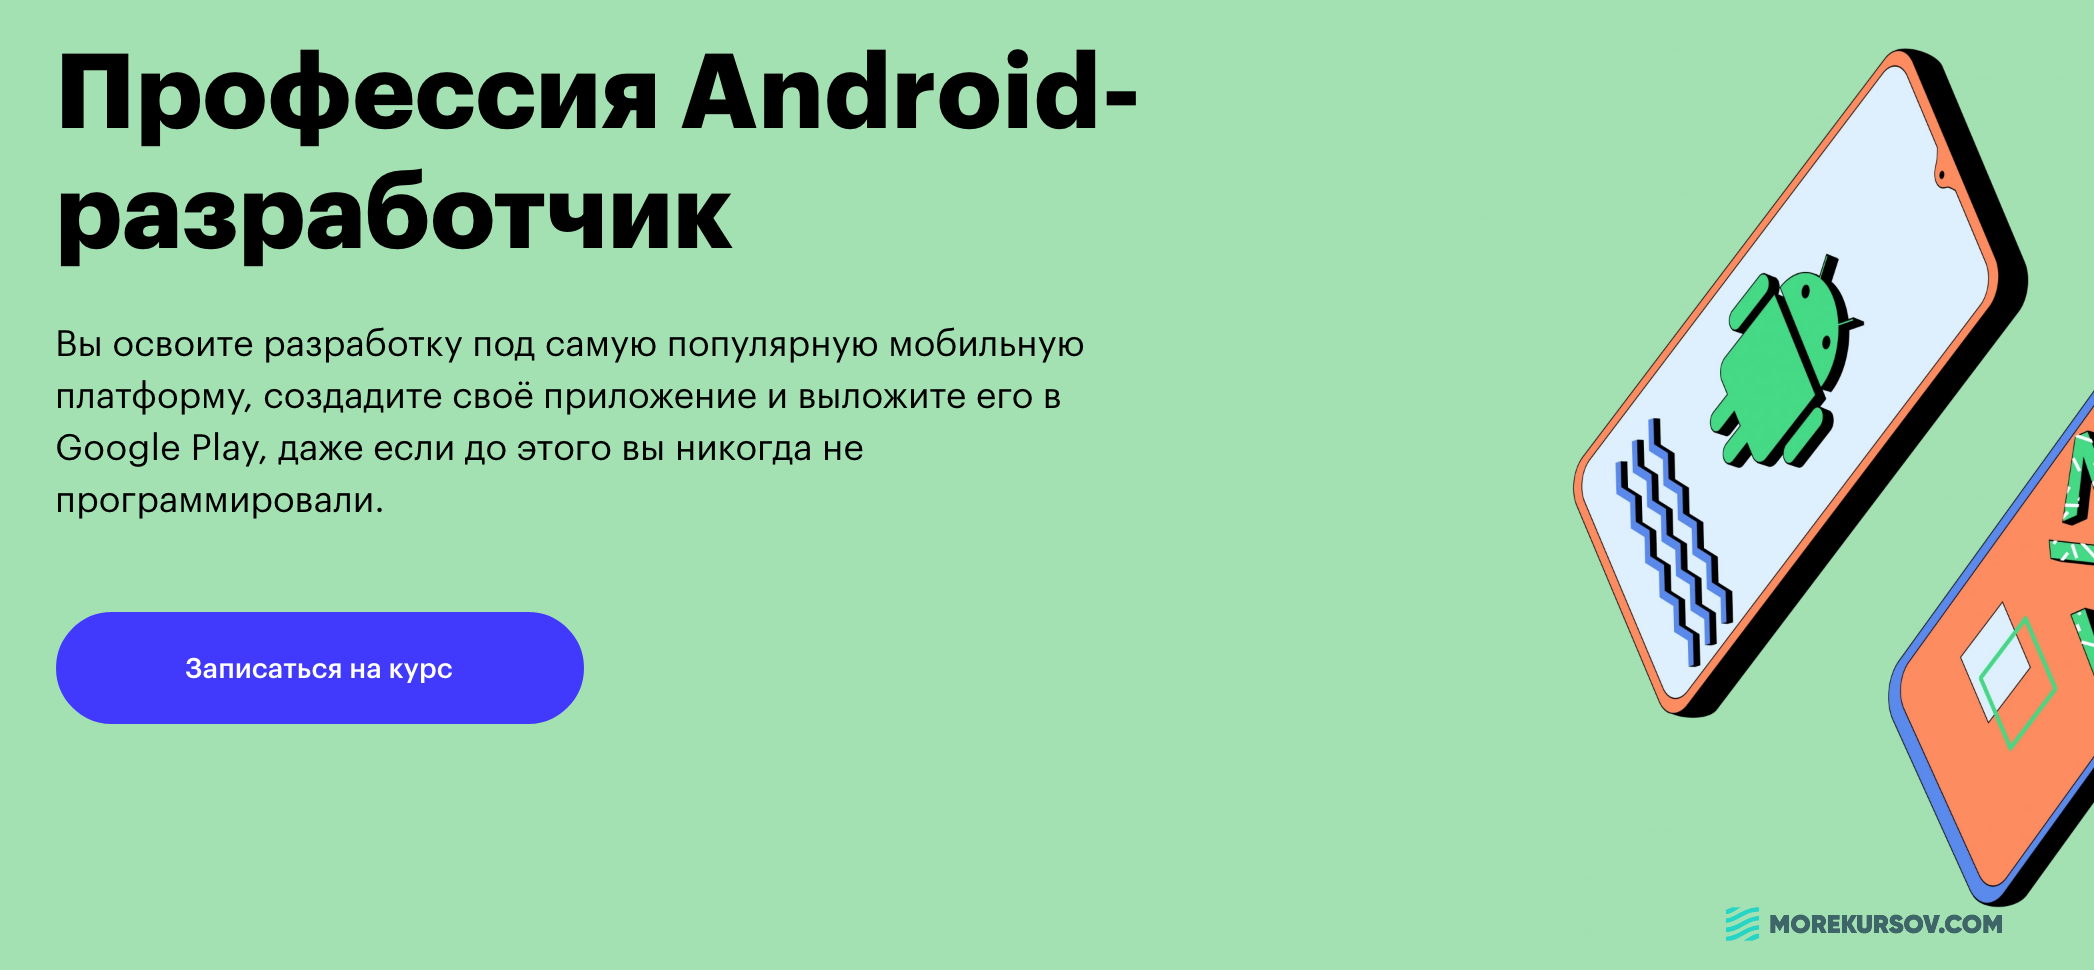 snimok-ehkrana-2020-09-13-v-10-38-27-png.9614